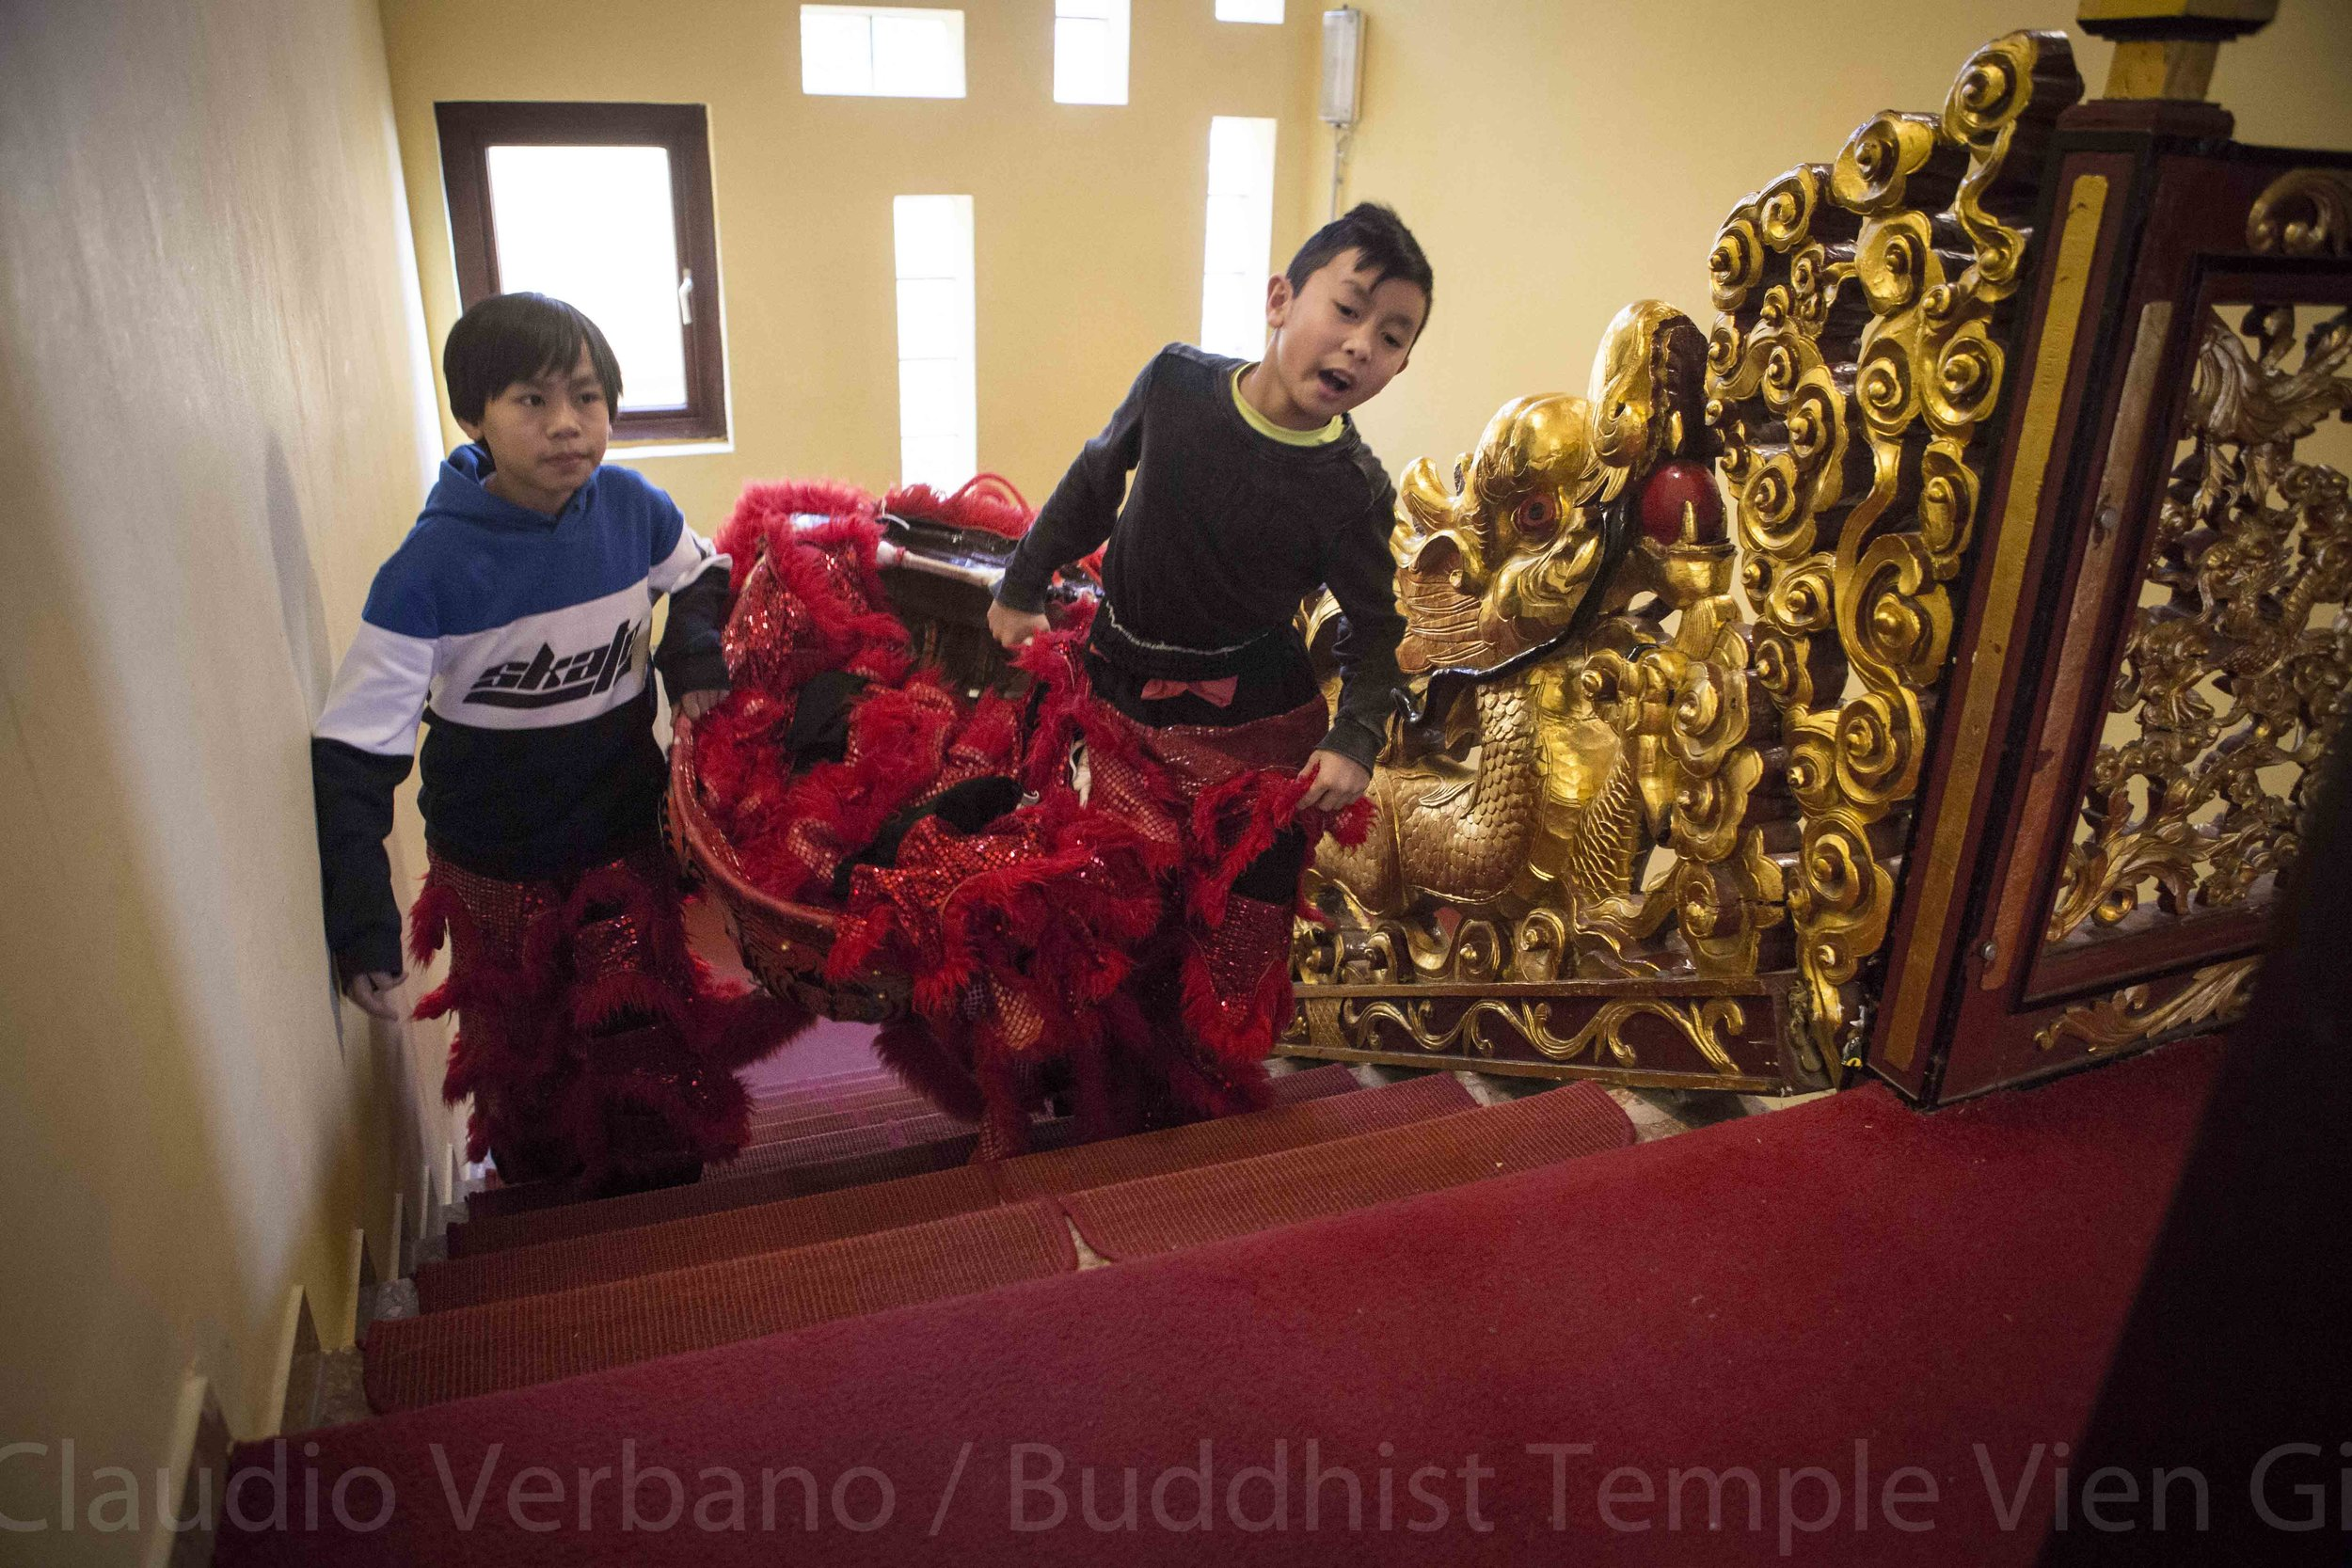 Buddhistischer Tempel Vien Giac Hannover Claudio Verbano_15.jpg